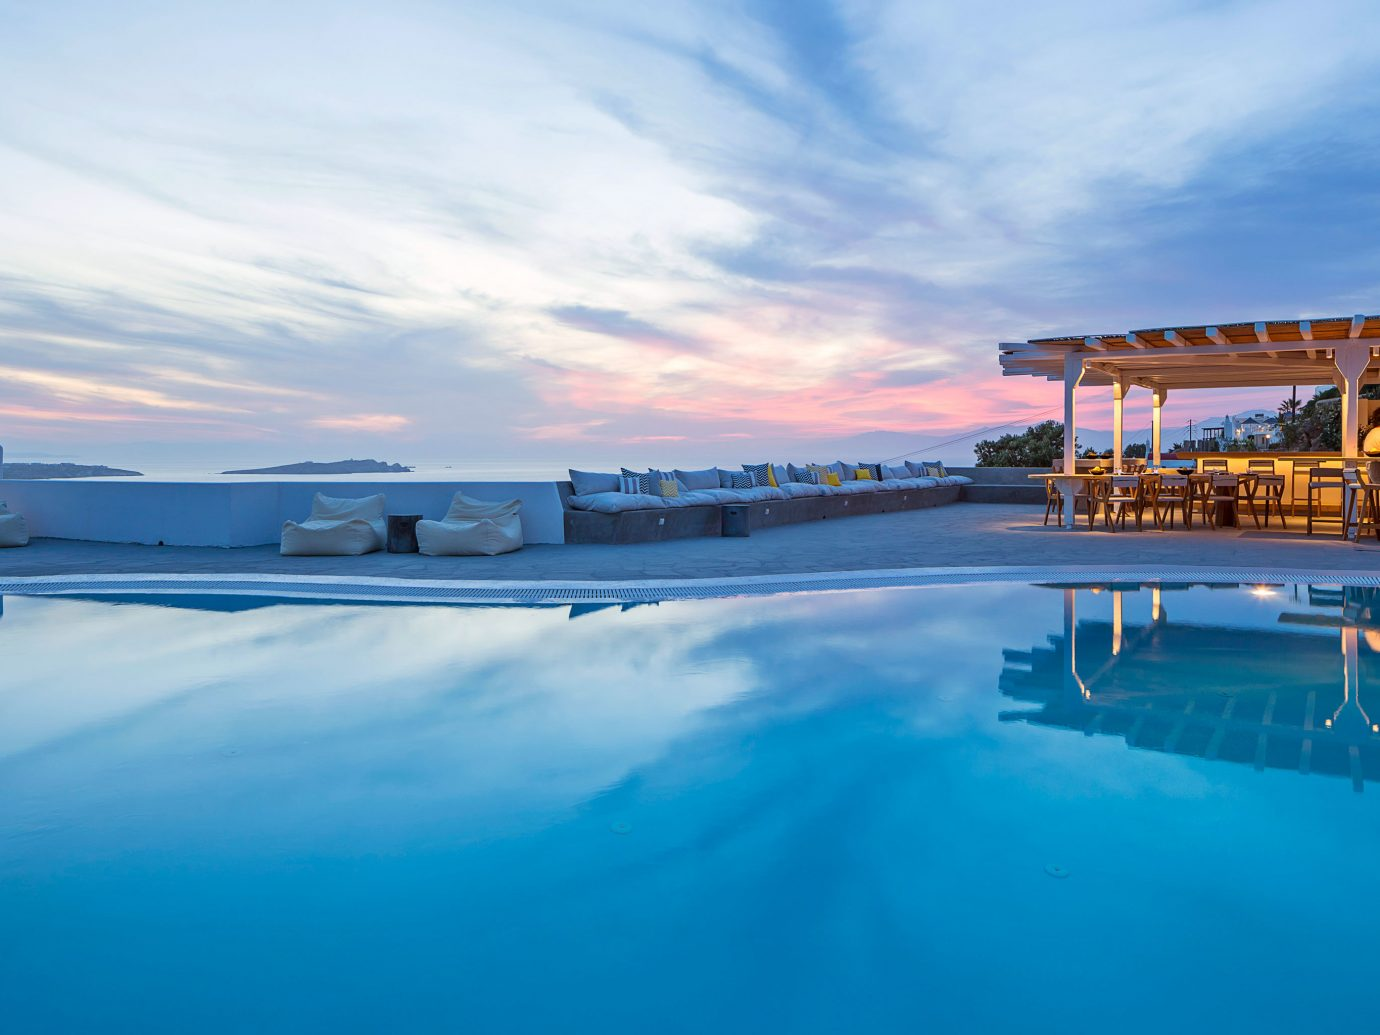 Hotels sky outdoor water Sea swimming pool Ocean scene reflection horizon vacation shore Coast bay dusk Beach blue day